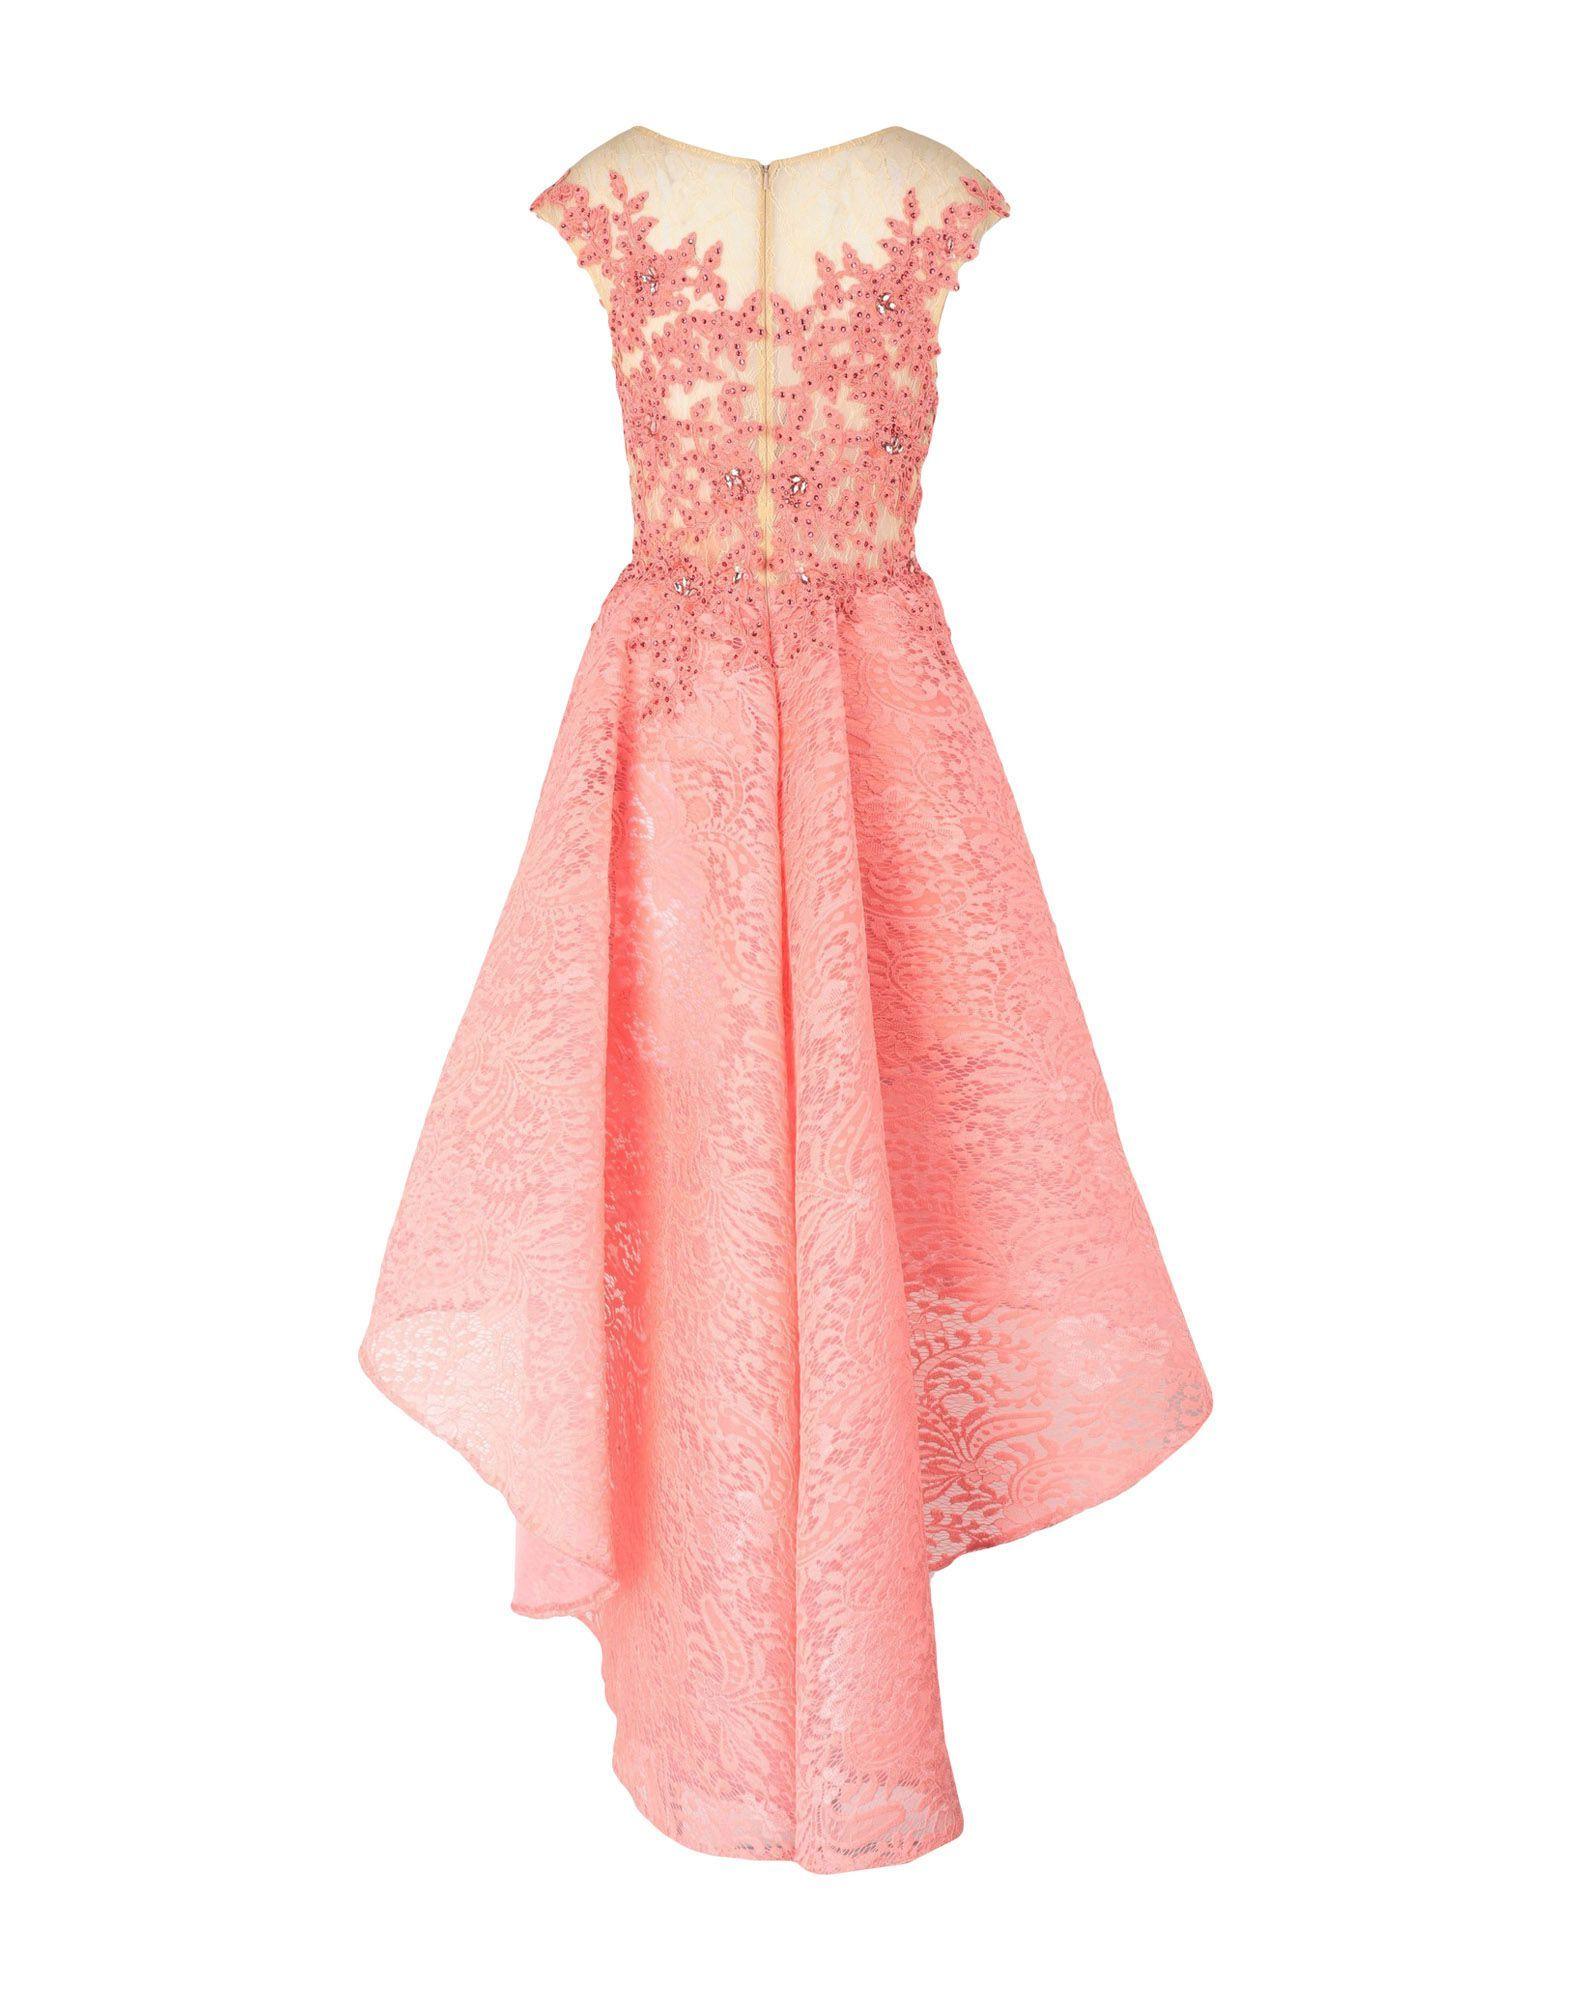 Forever Unique Coral Lace Embellished Dress